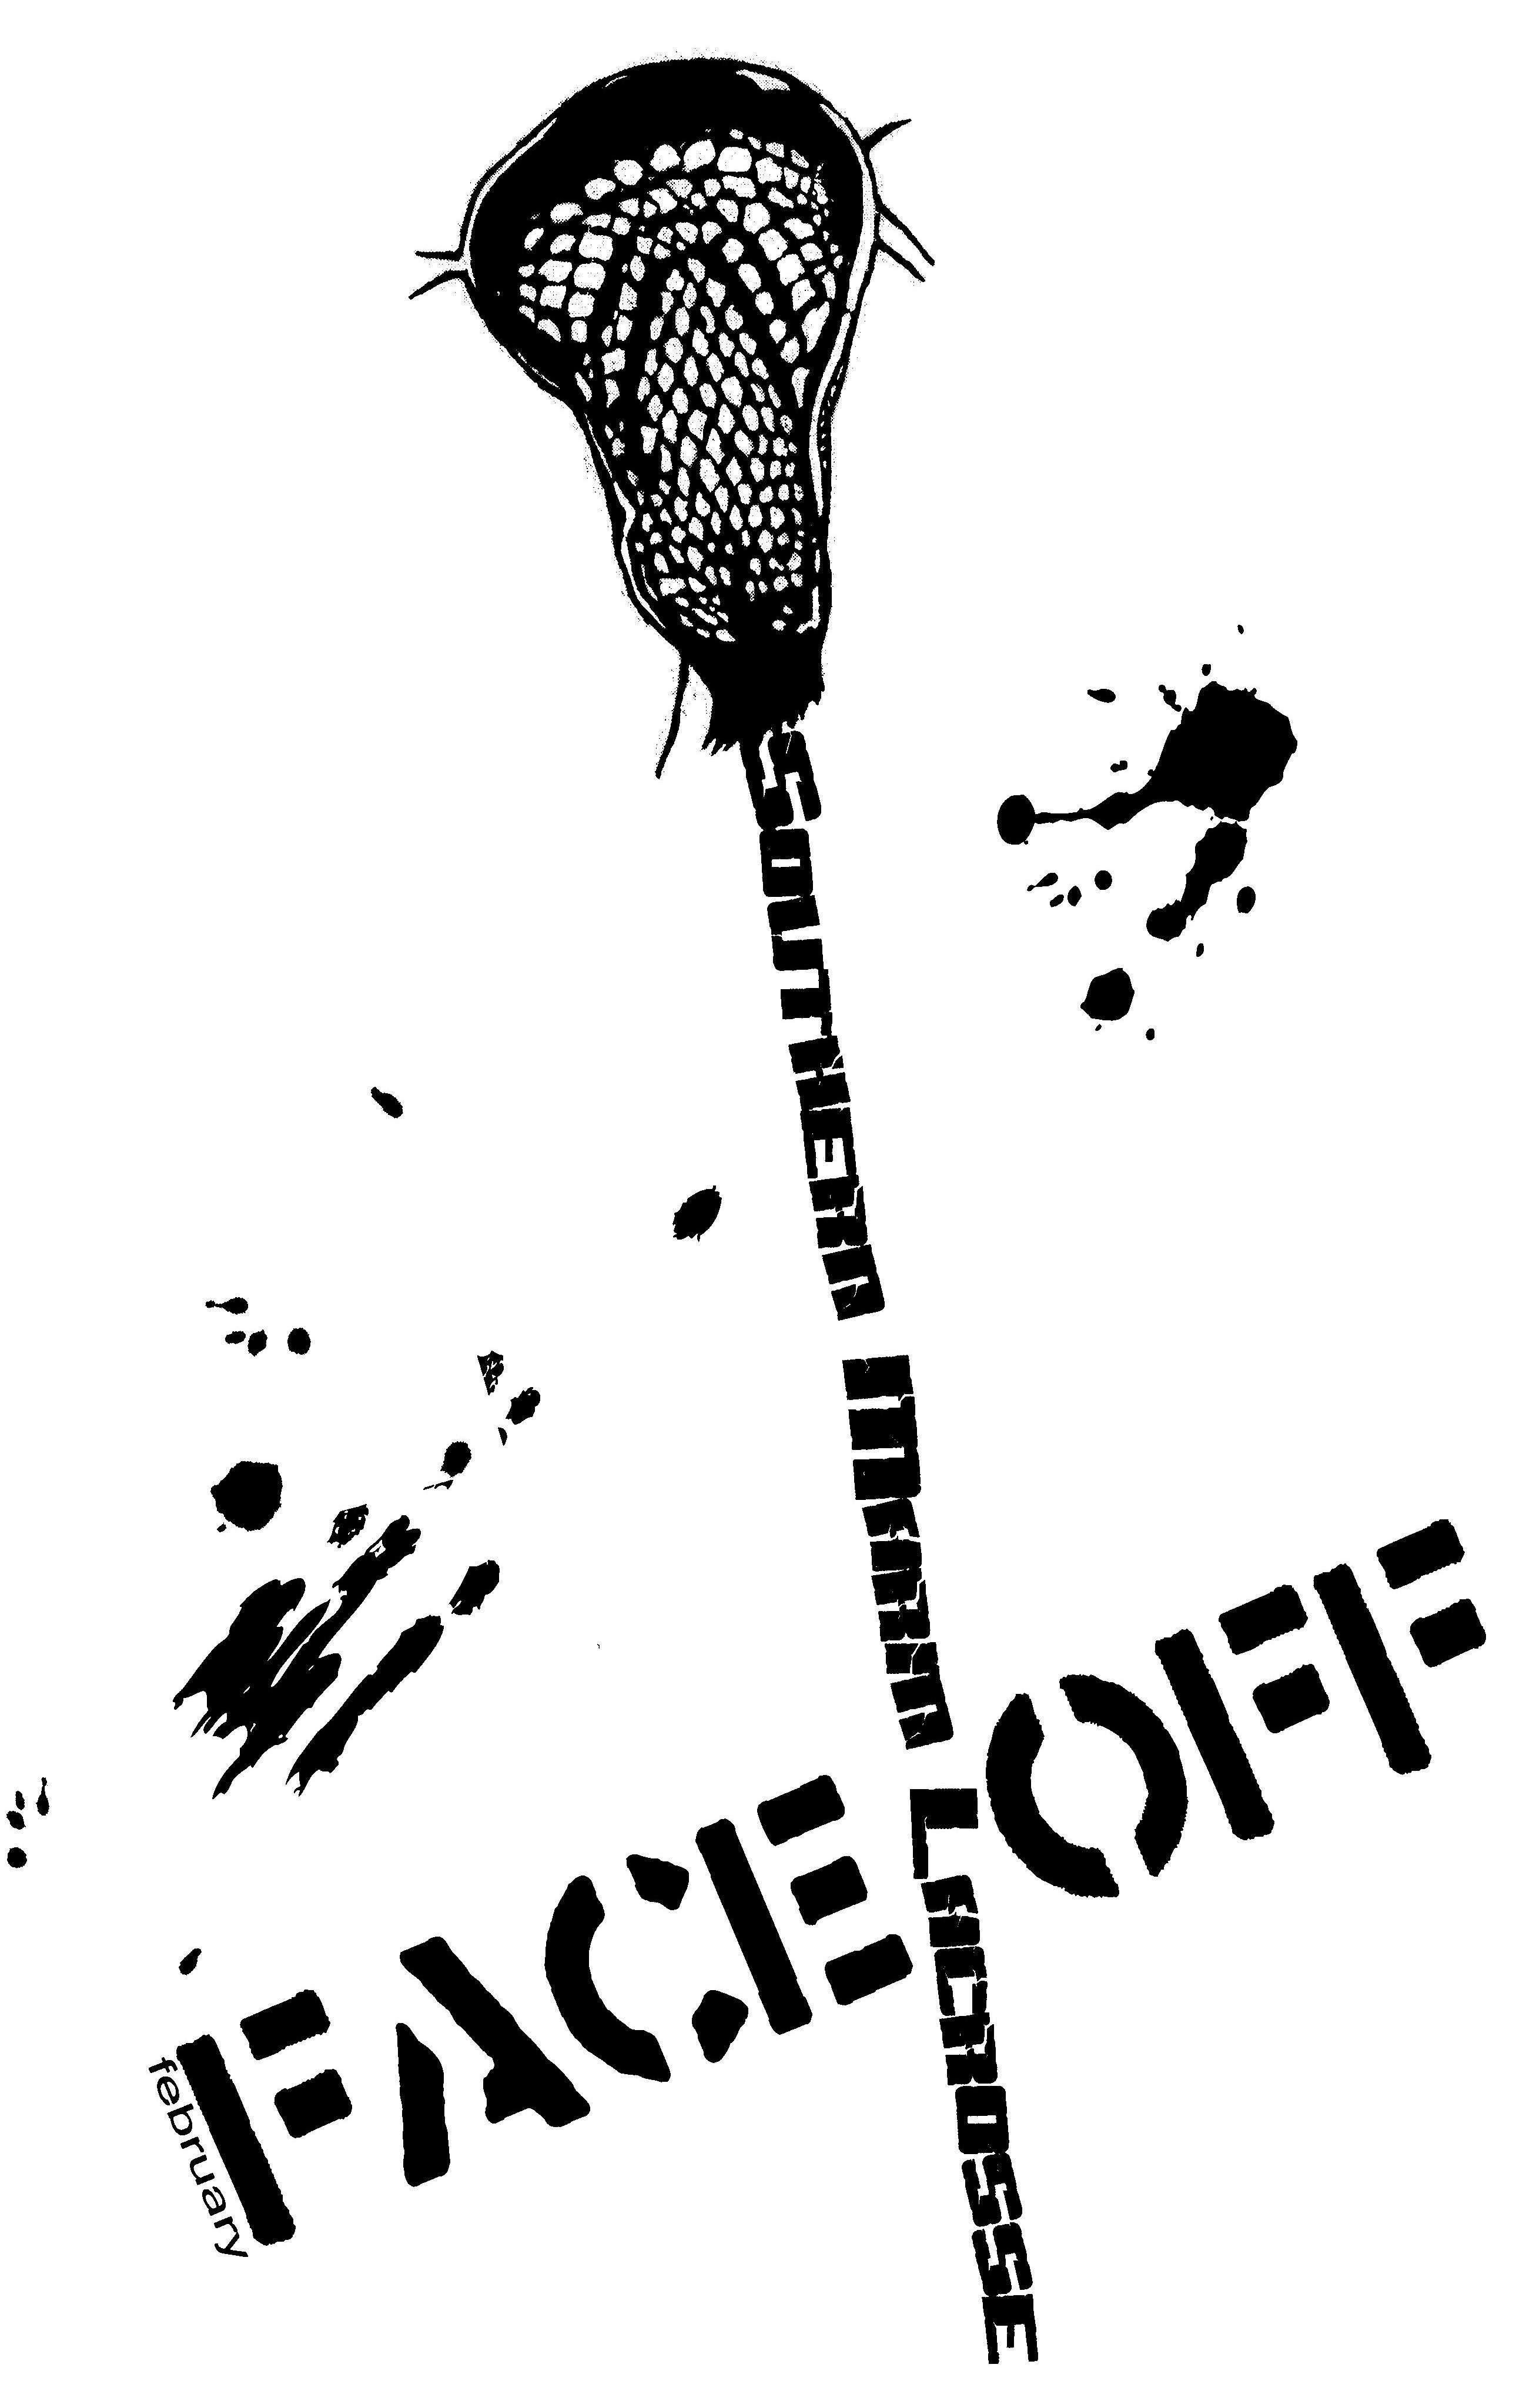 Northern California Club Lacrosse: Southern Marin Lacrosse